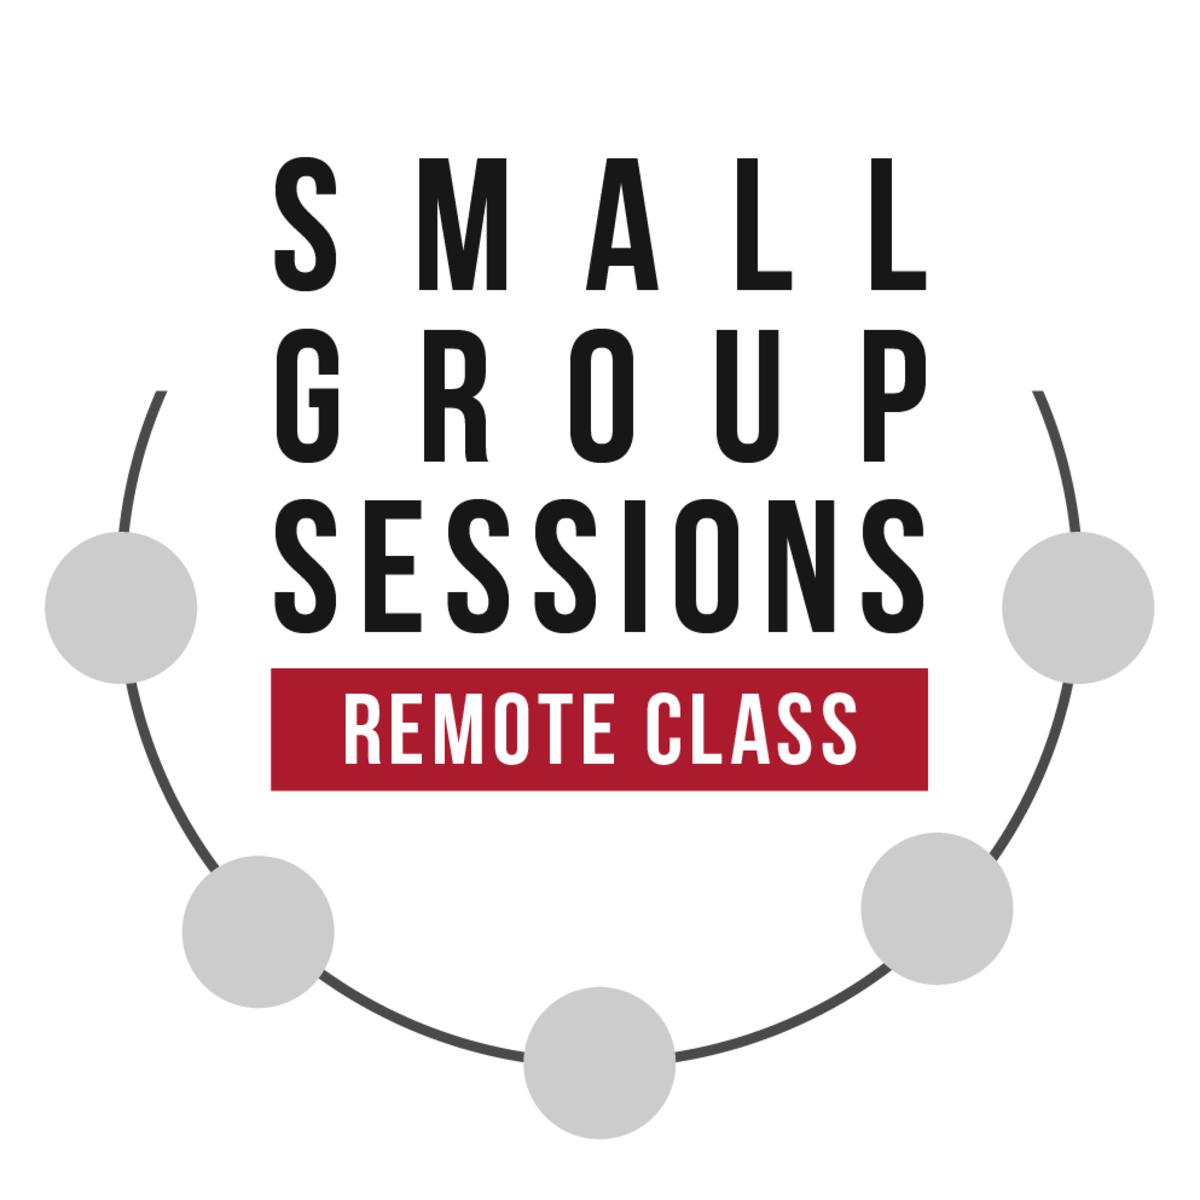 Smallgroupsessions websiteeventthumbnail